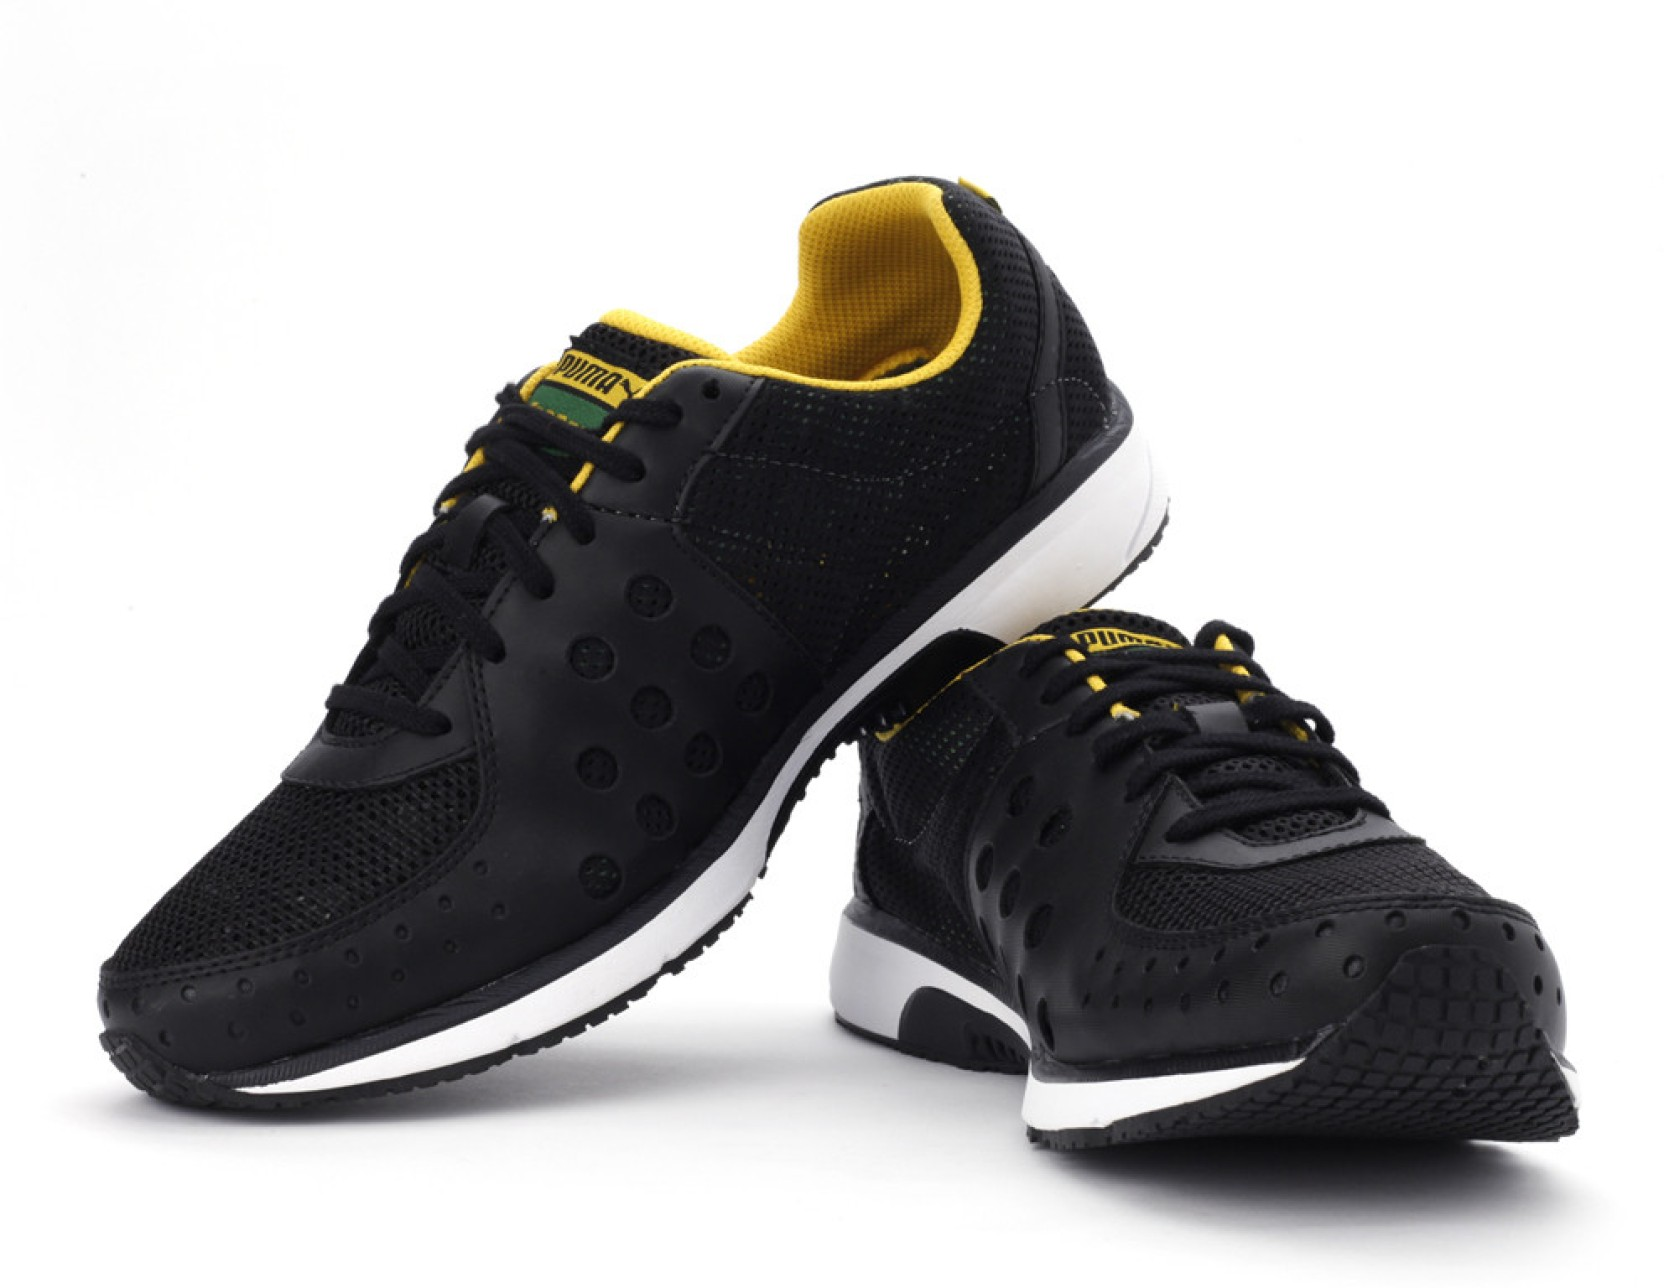 1ed6ecaff098a Puma Faas 300 Jam II Running Shoes For Men